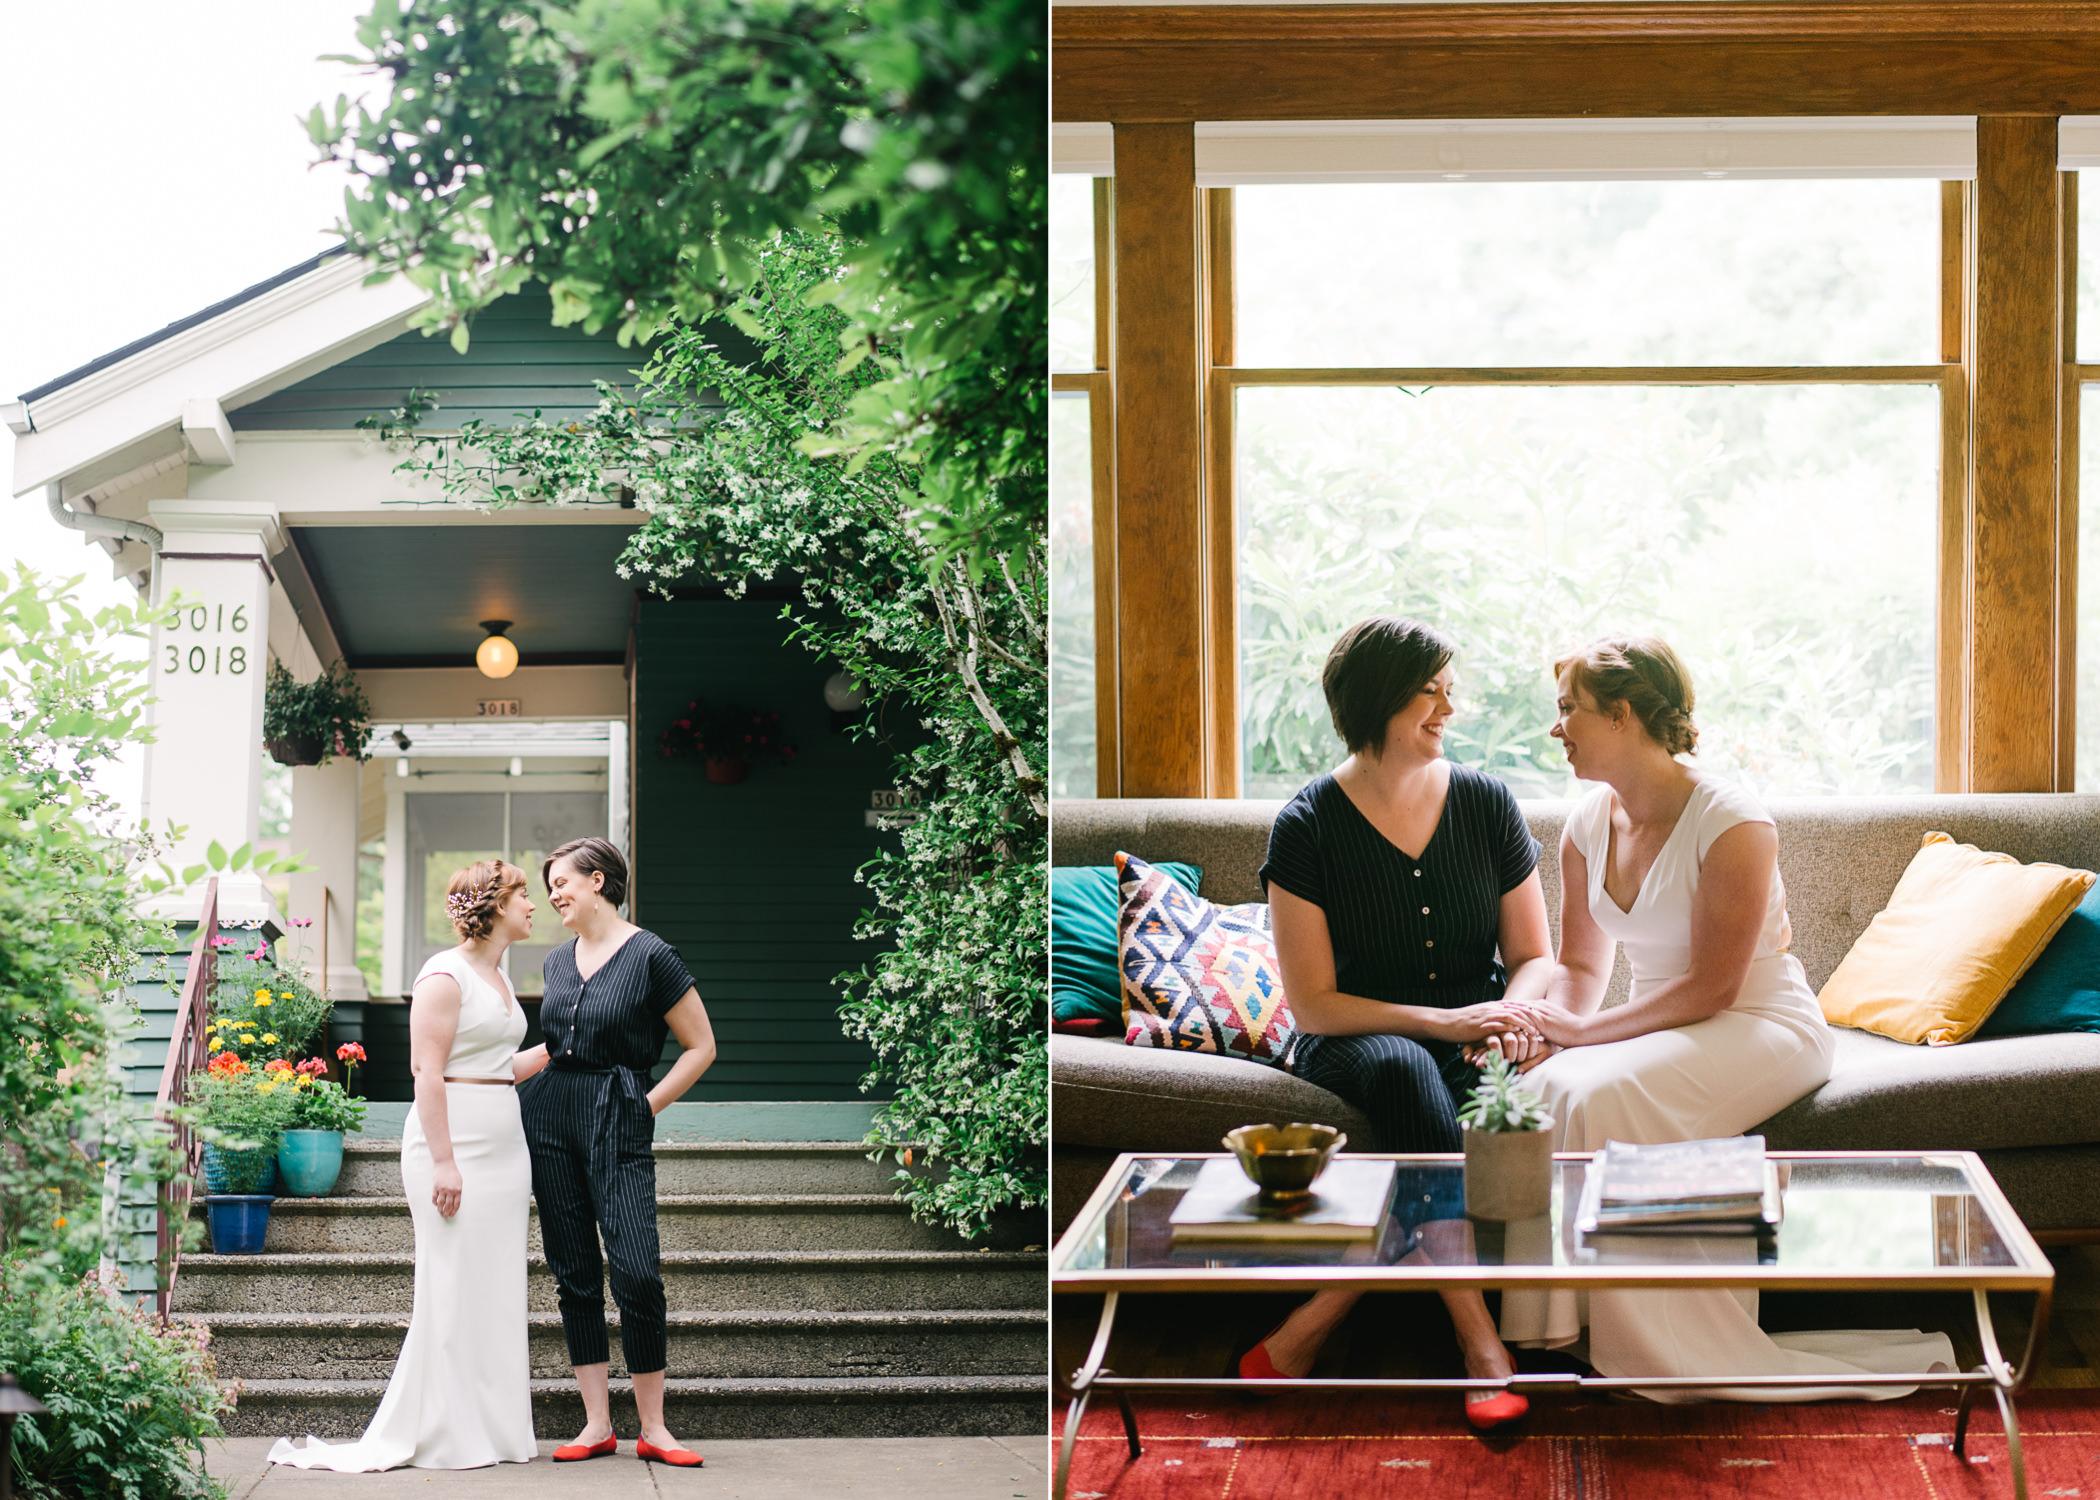 cathedral-park-portland-elopement-gay-wedding-010.JPG